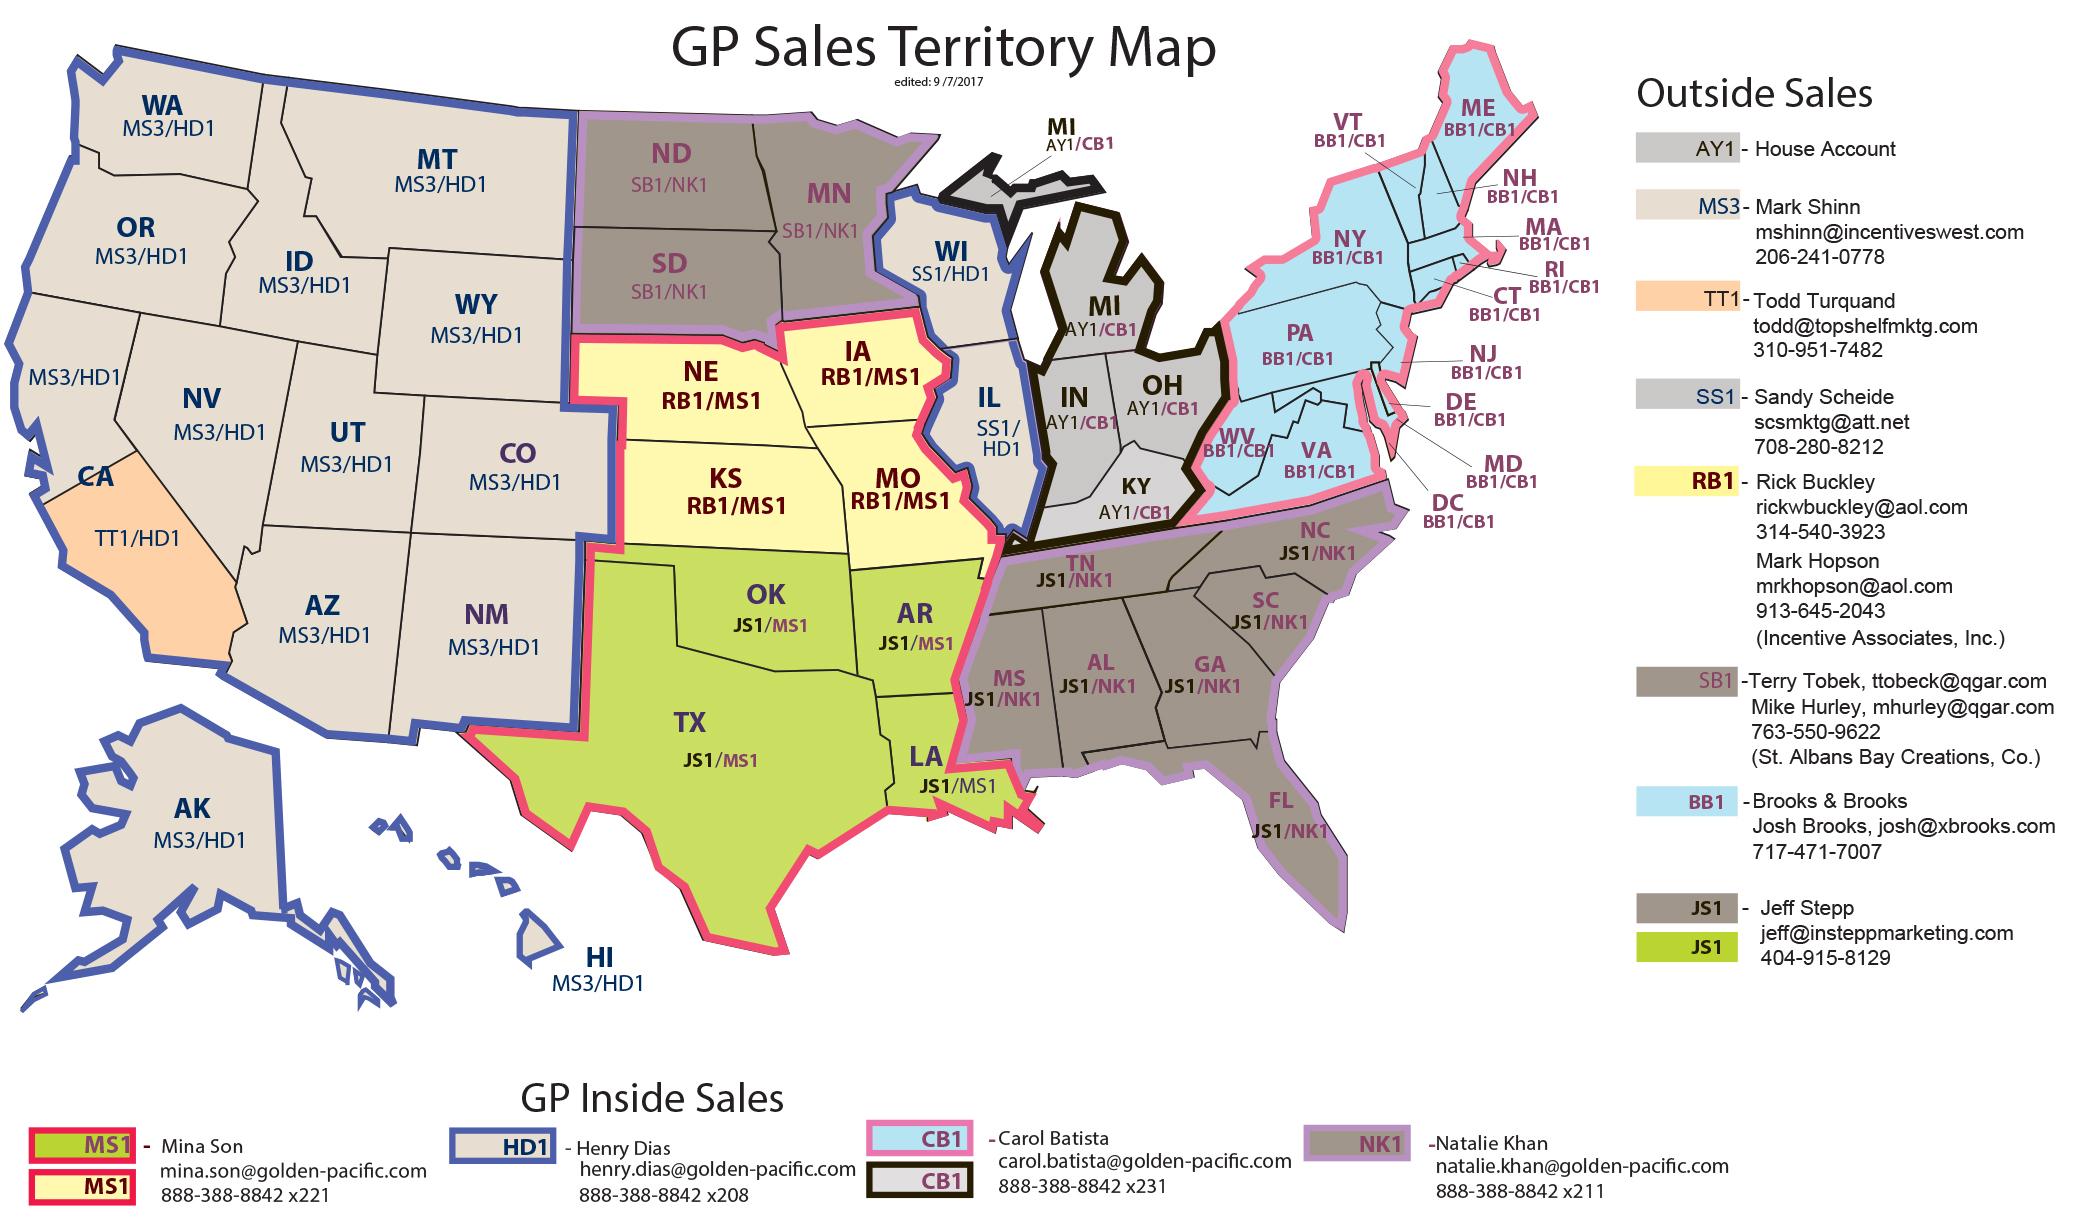 sales rep territory 07-27-2017 w info